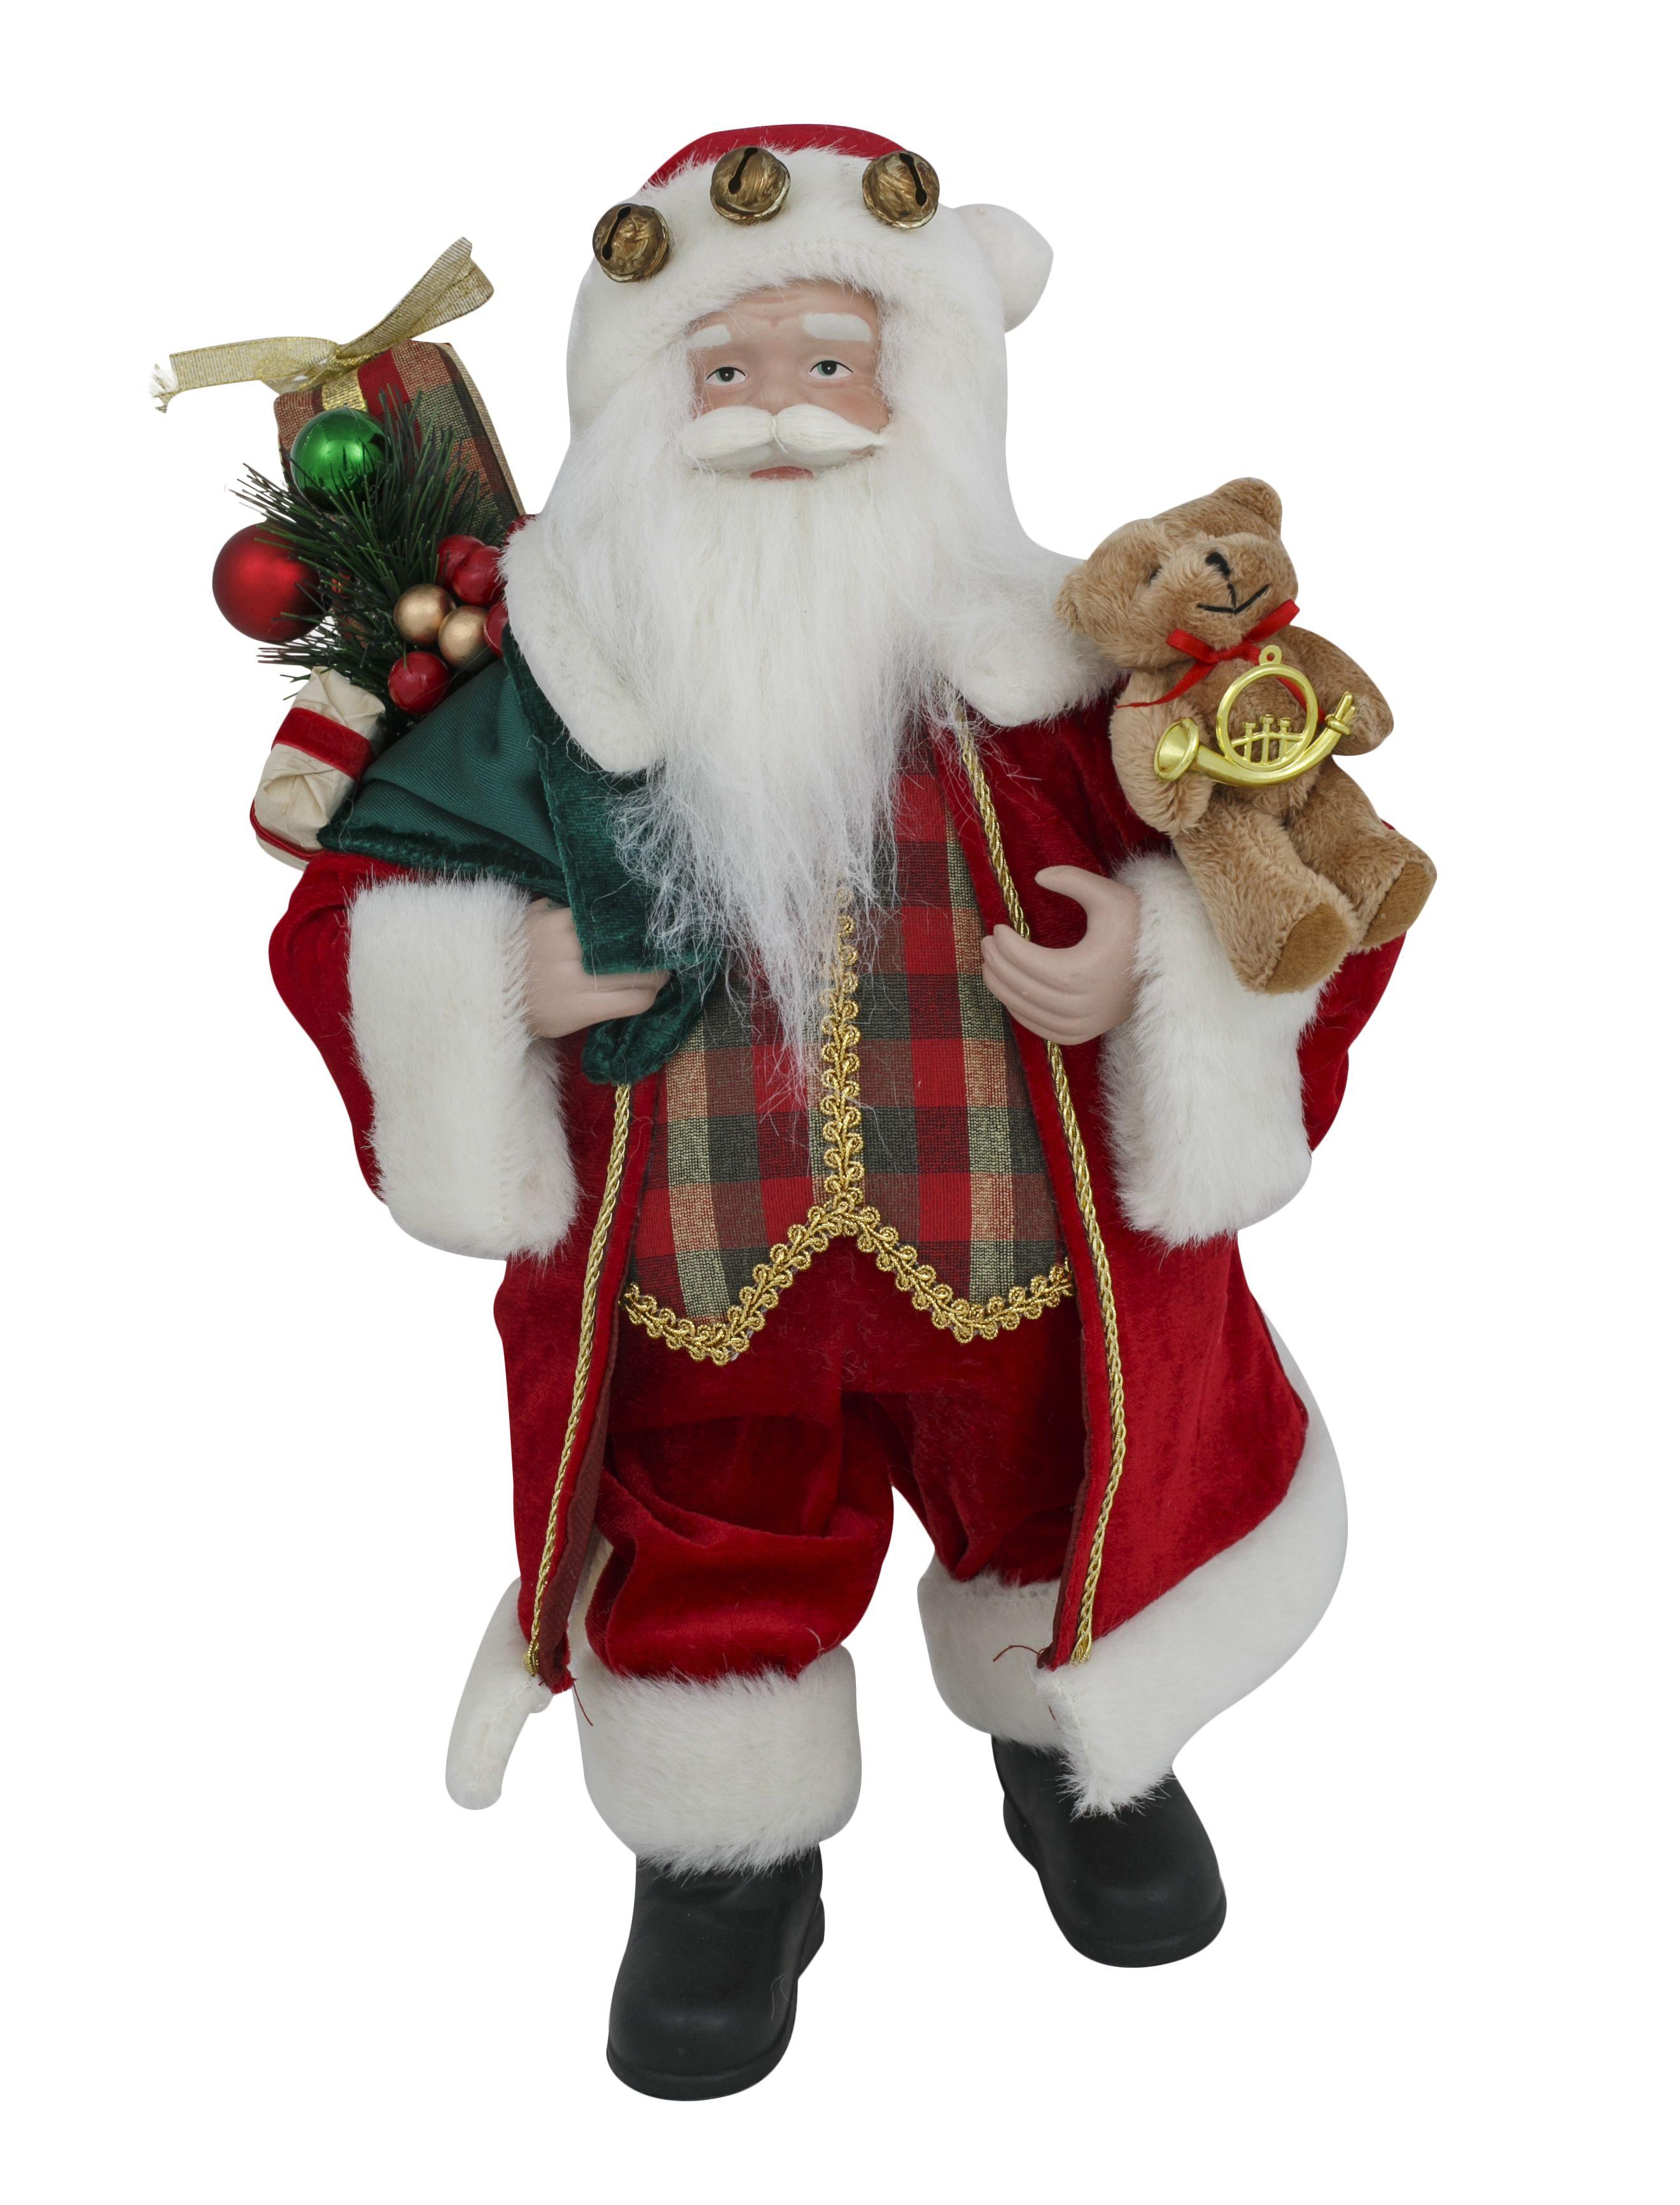 Christmas Decorations, Xmas Gifts, Lights Australia